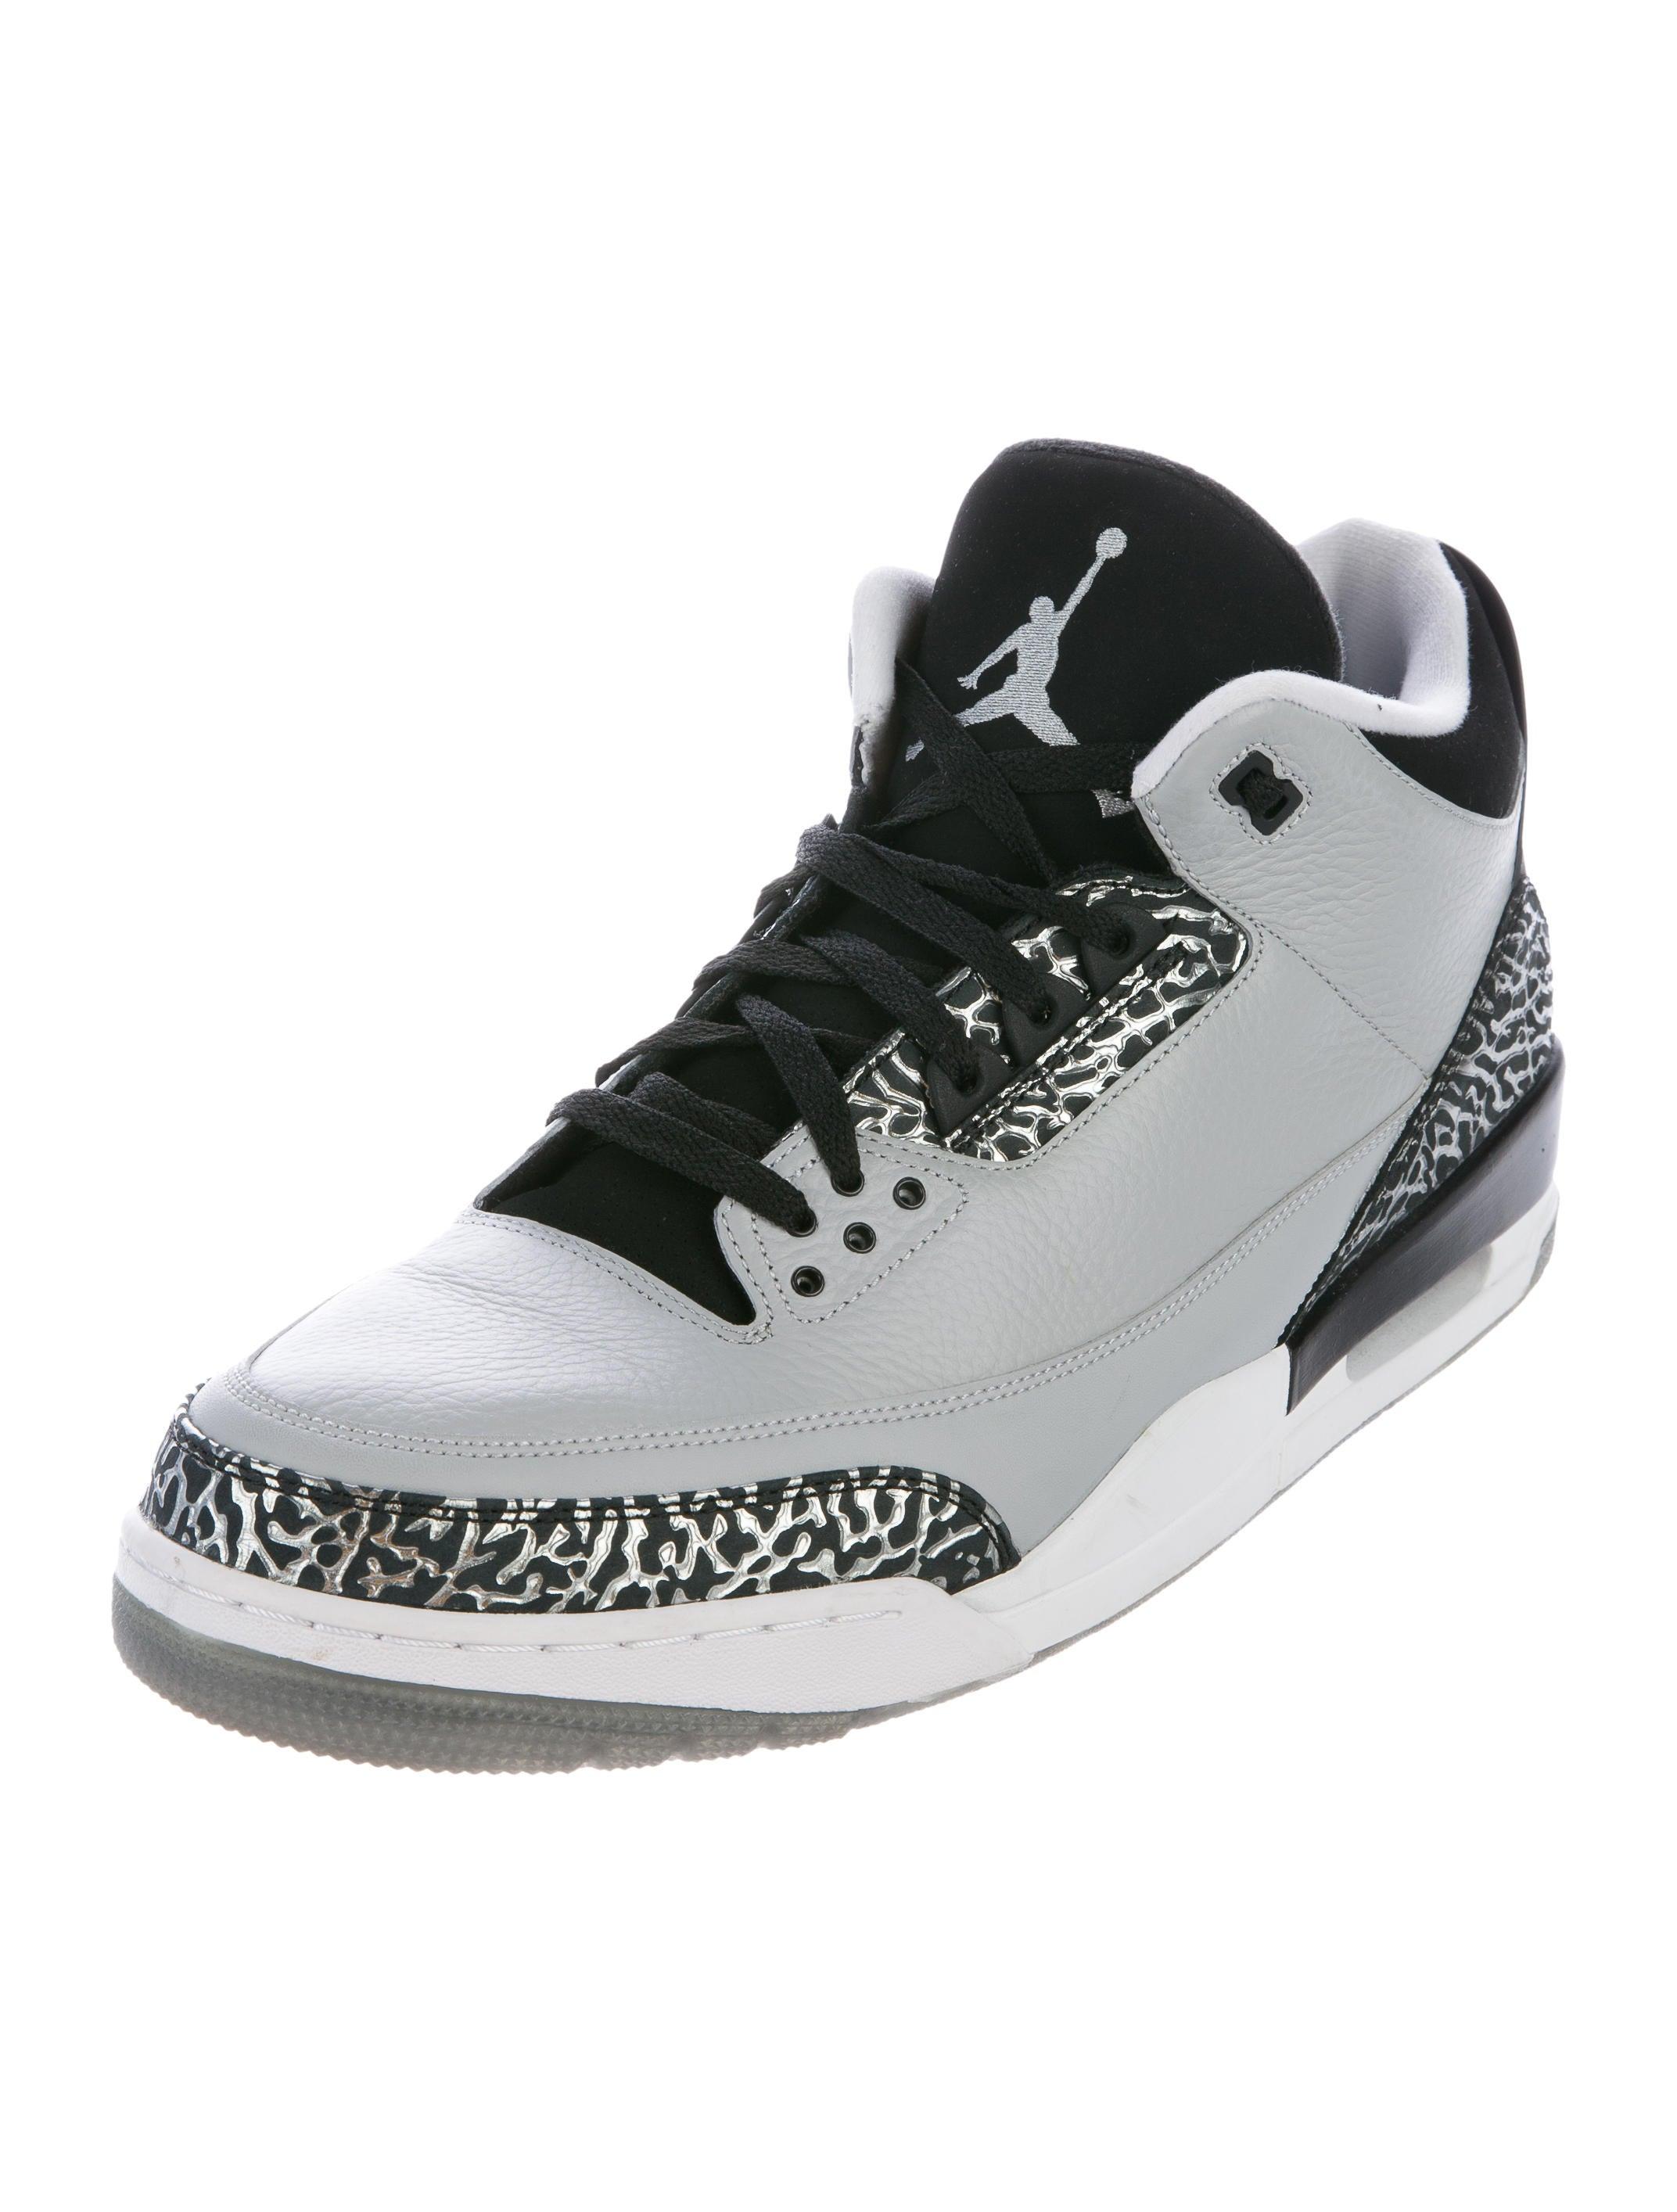 nike air jordan 3 retro wolf grey sneakers shoes wniaj20401 the realreal. Black Bedroom Furniture Sets. Home Design Ideas